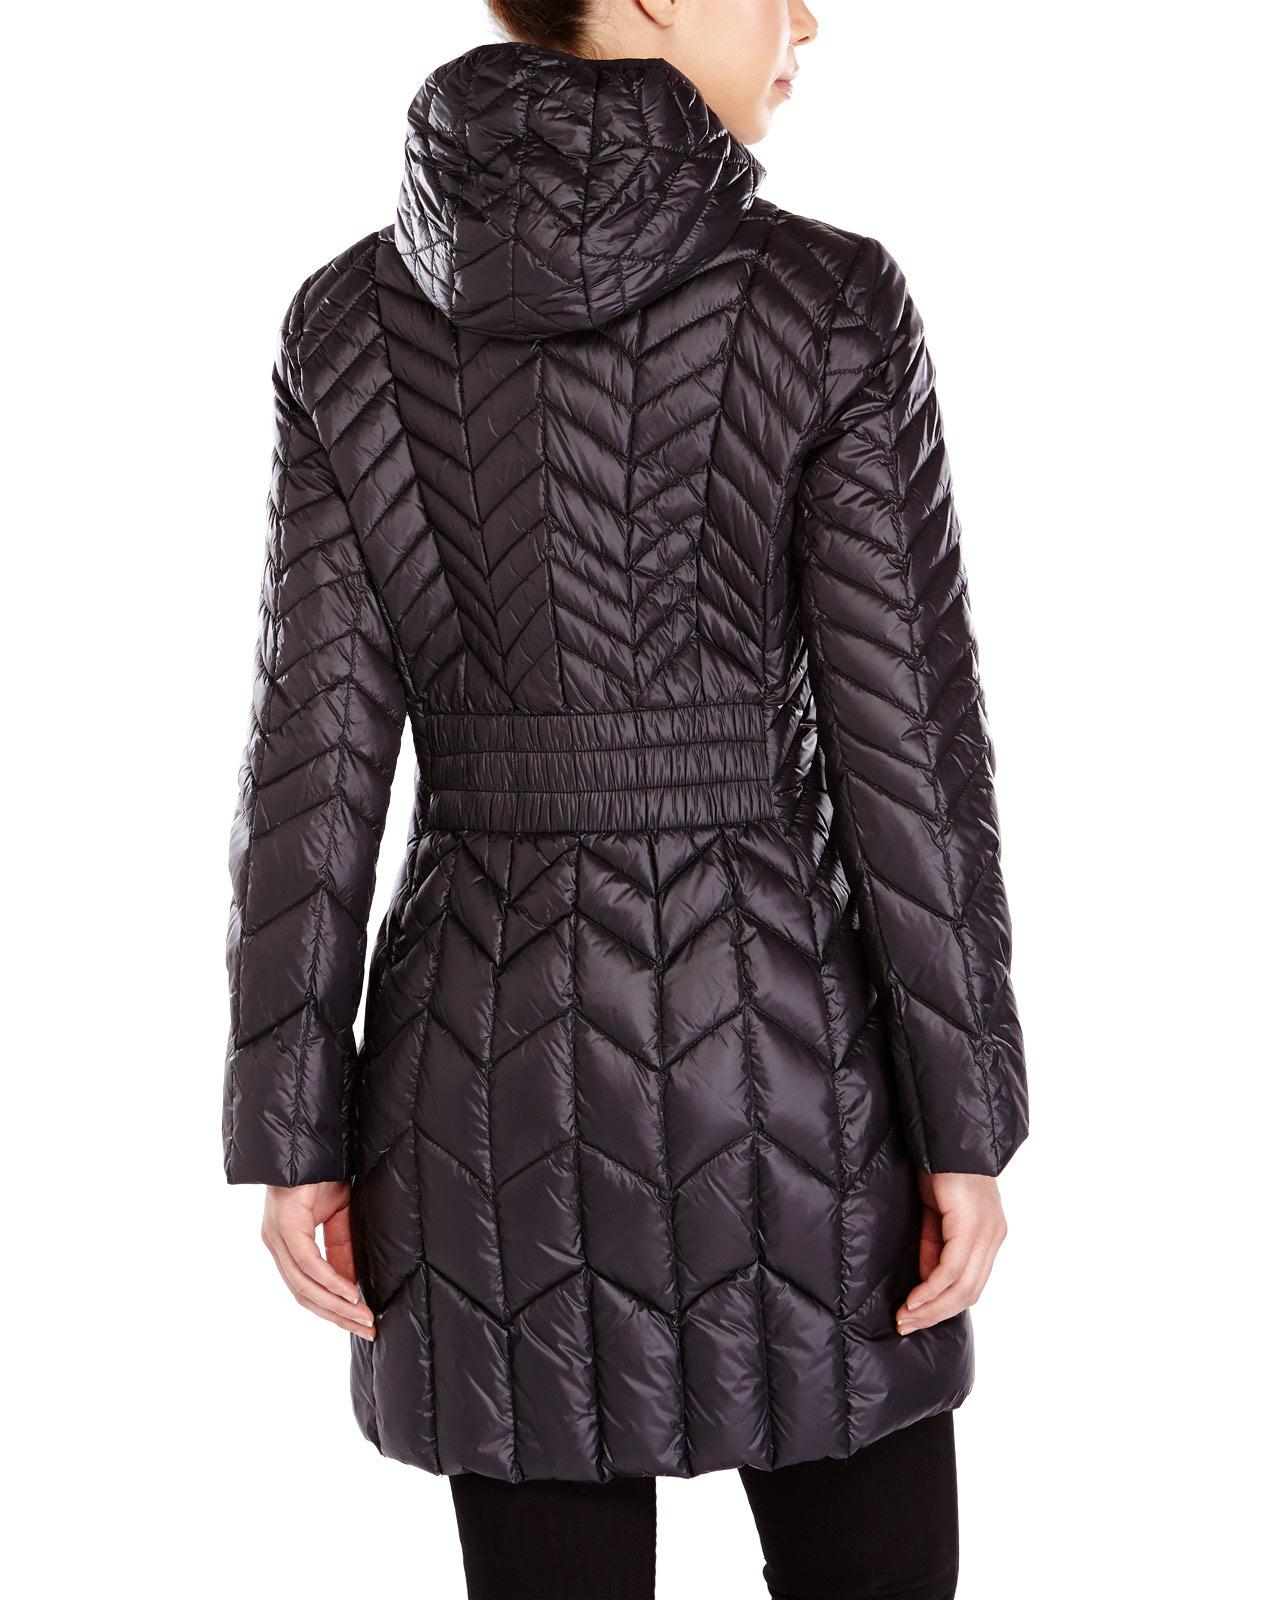 Lyst London Fog Hooded Packable Down Jacket In Black